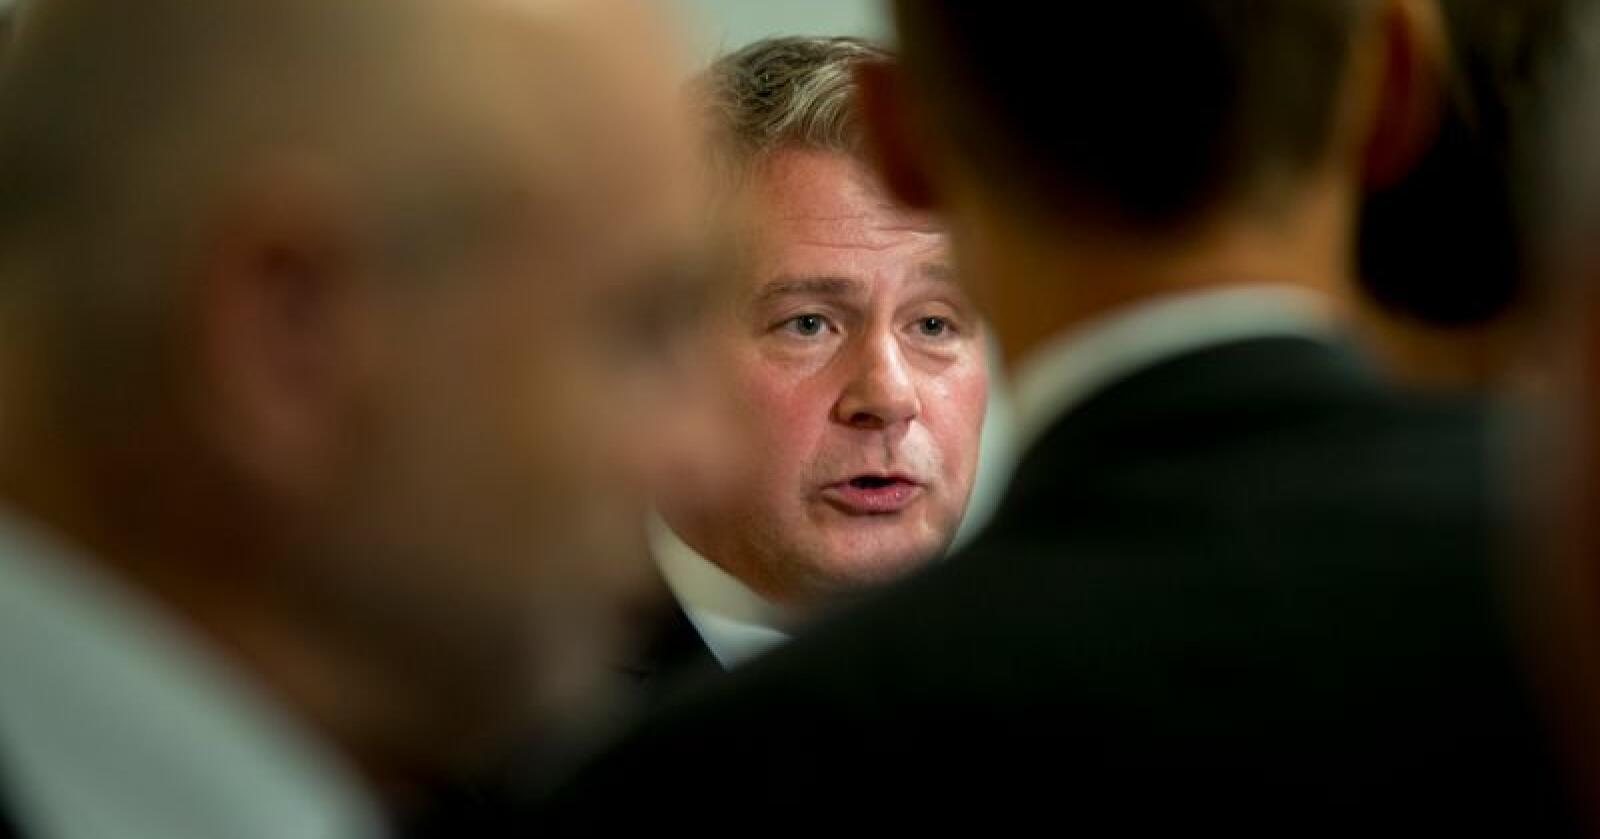 Tidligere justis- og beredskapsminister Per-Willy Amundsen. Foto: Vidar Ruud / NTB scanpix